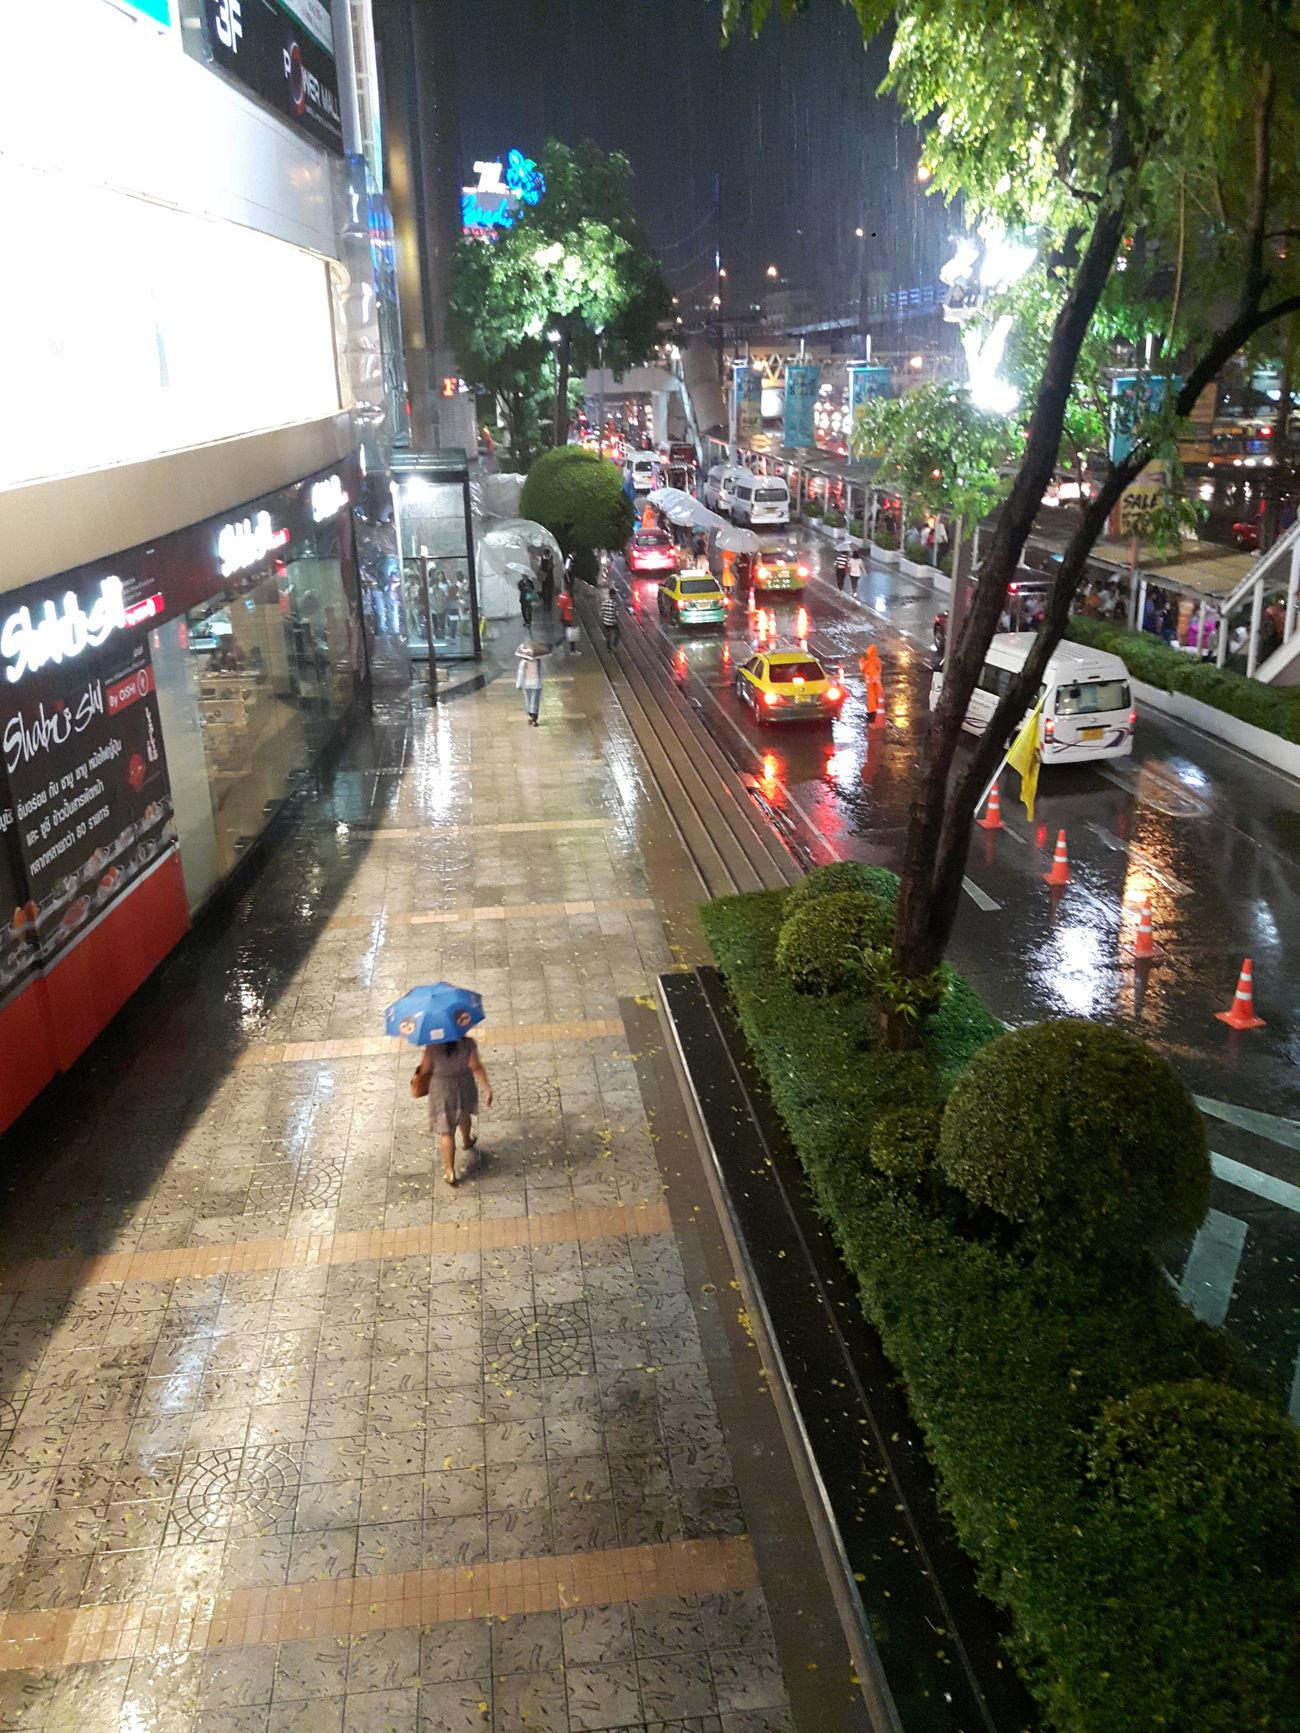 Among the rain Rain Rainyseason In The City Drops Of Rain City Life City Street Eyeemthailand Streetphotography Lifeontheroad